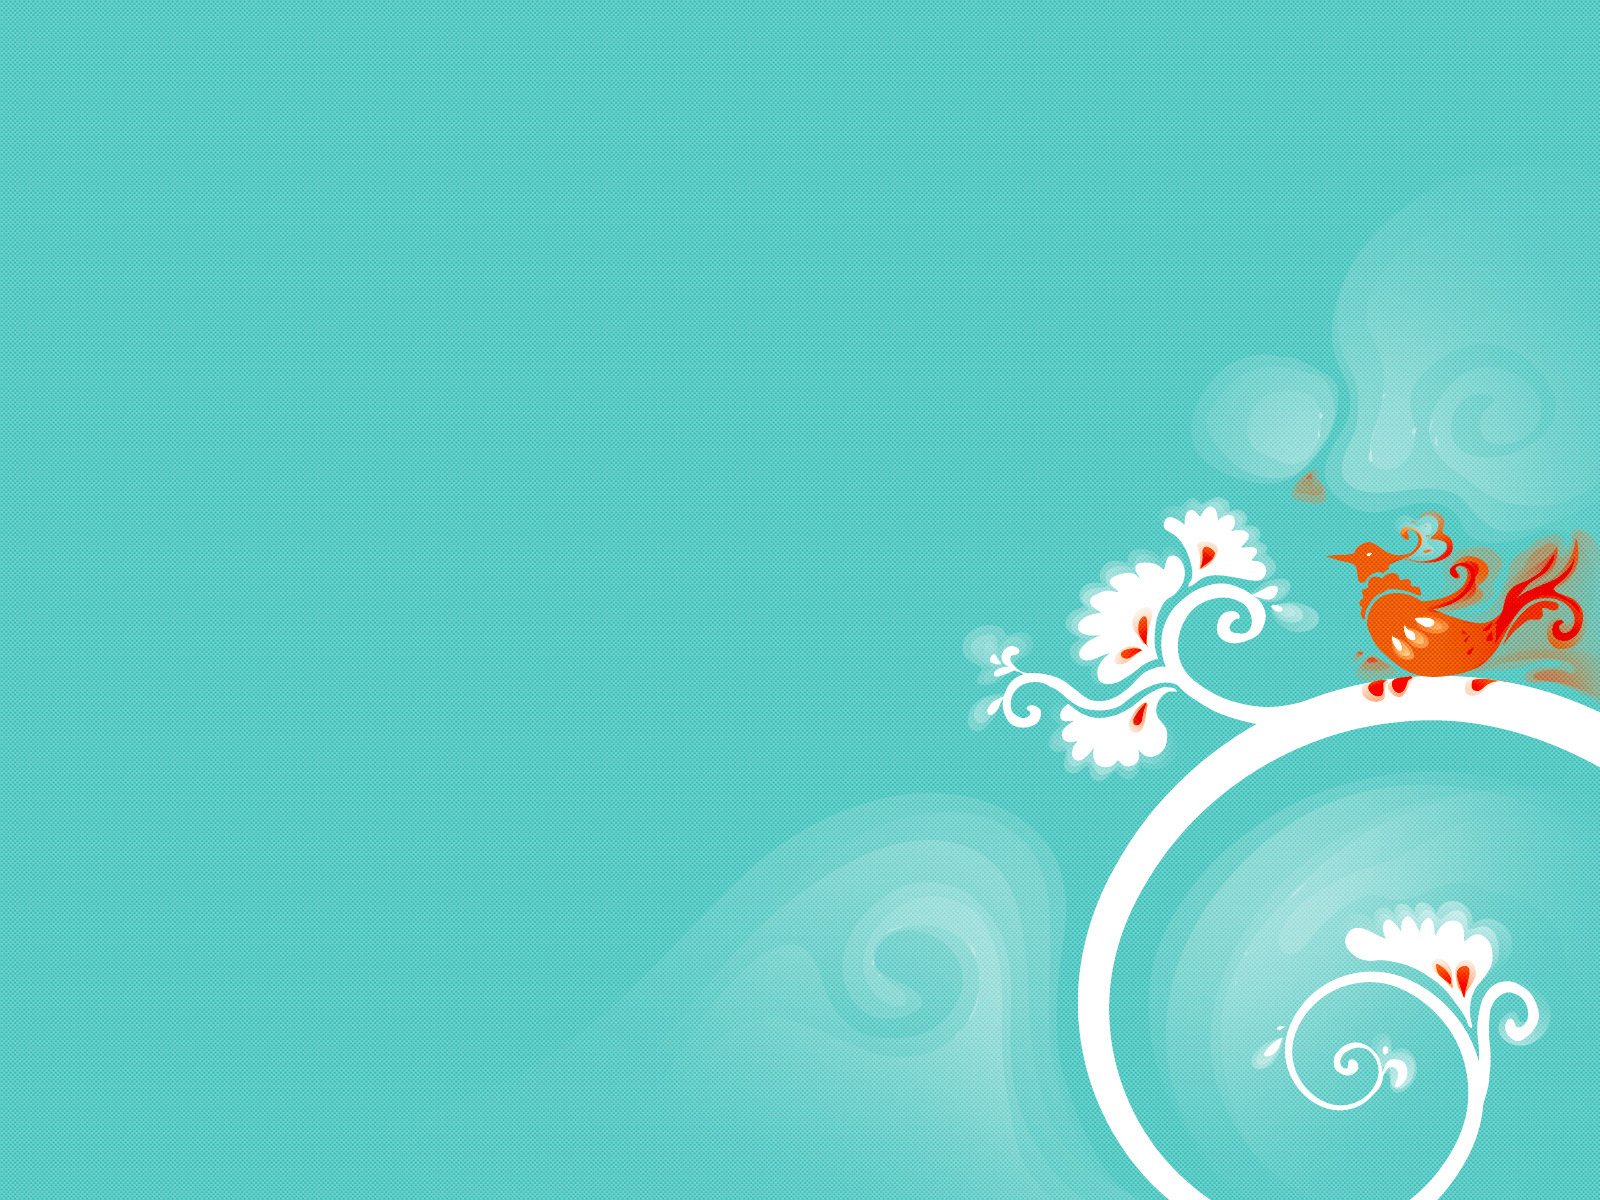 Free dekstop wallpaper: birds-of-fire-fullscreen-wallpaper-1600x1200